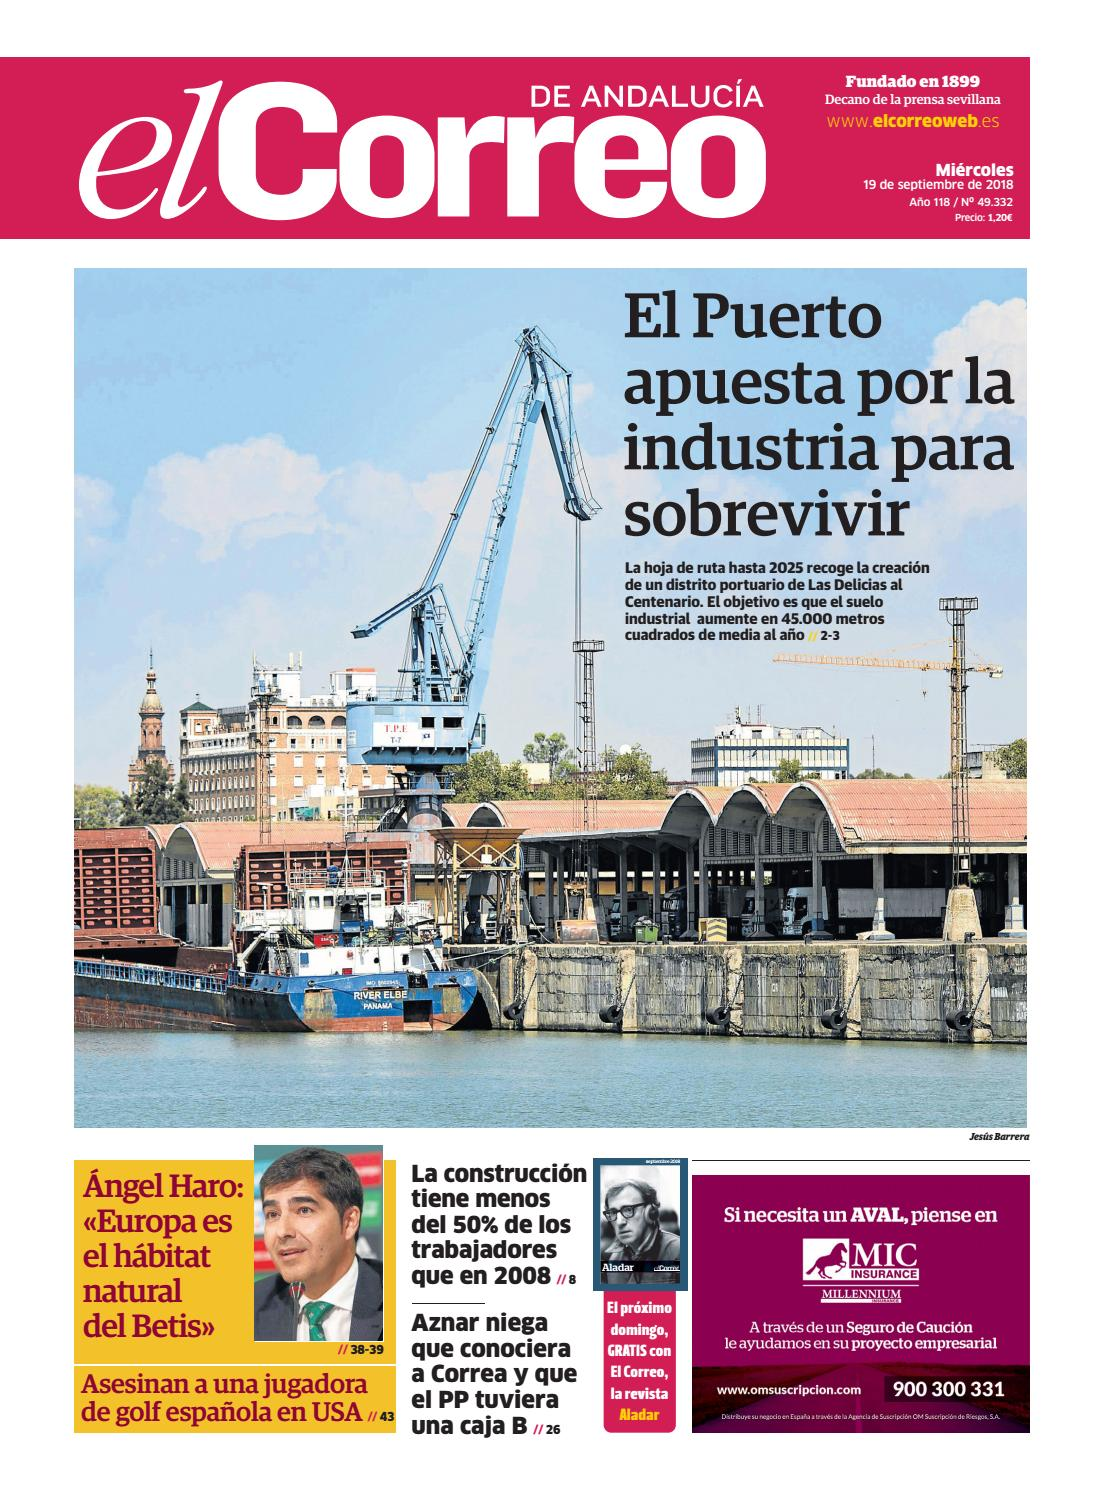 19.09.2018 El Correo de Andalucía by EL CORREO DE ANDALUCÍA S.L. - issuu 30e26351e45